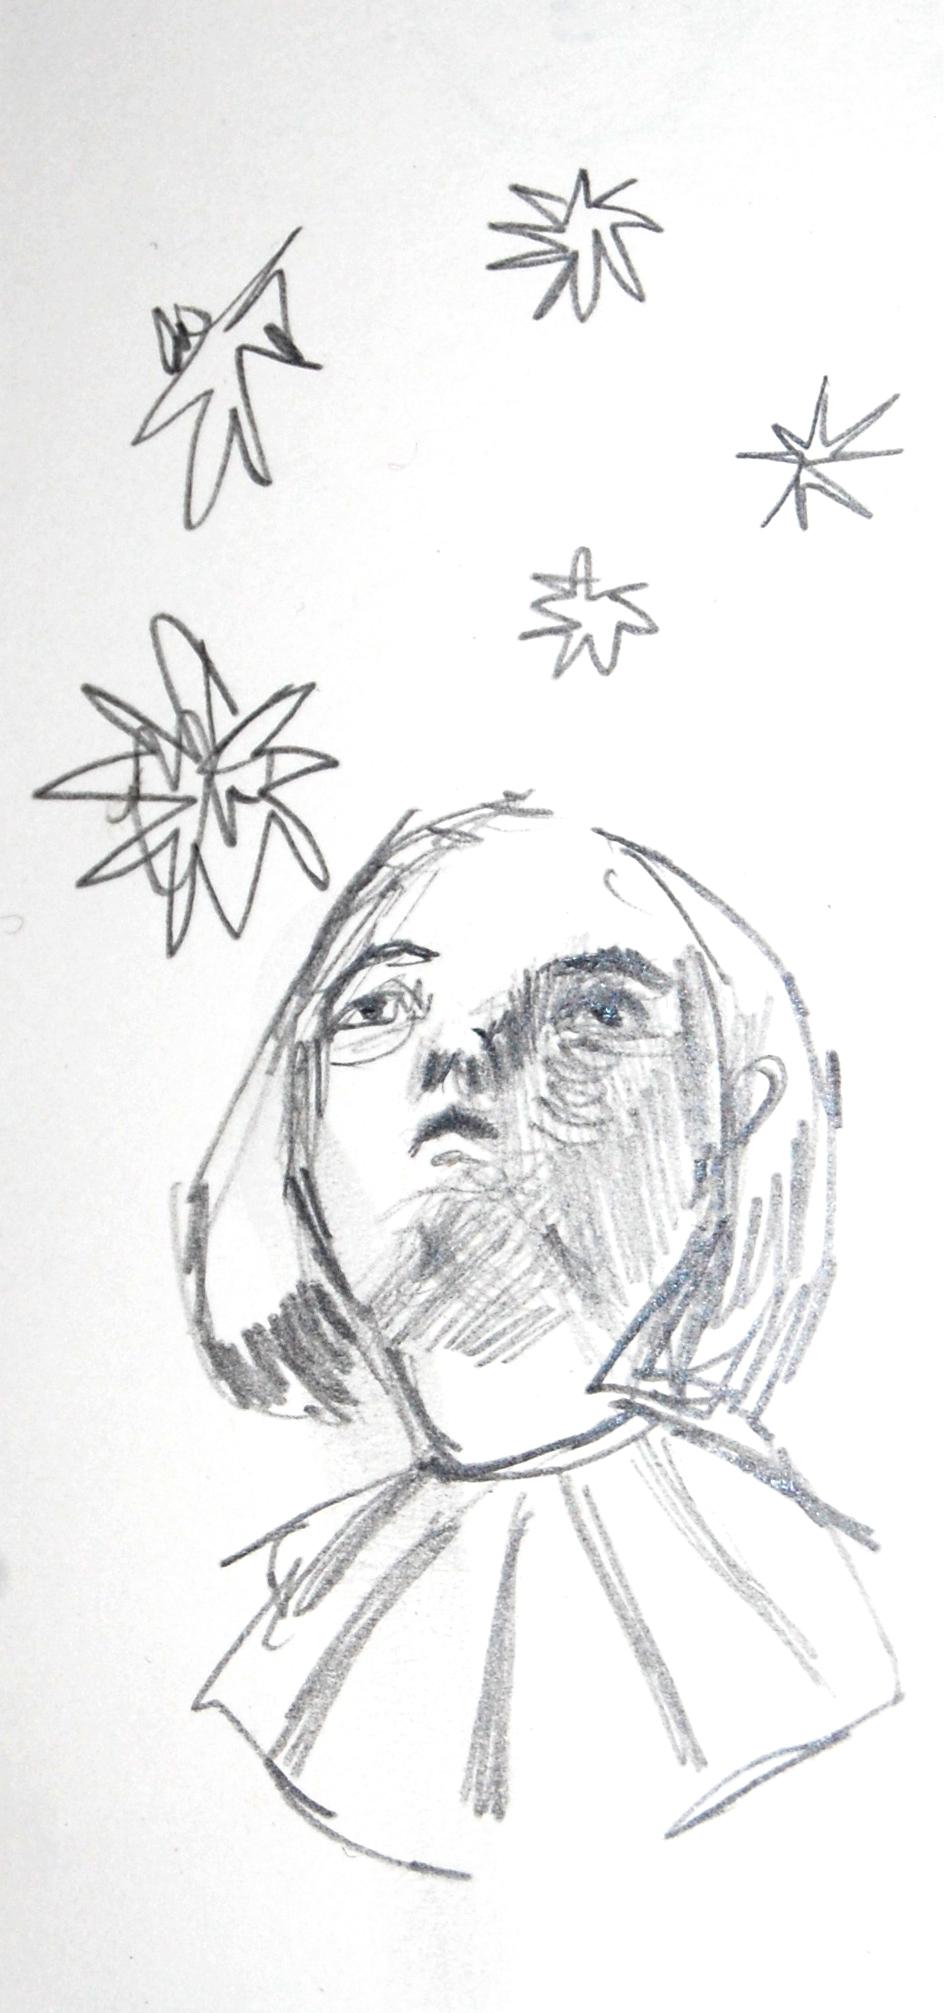 Stars (Pencil sketch)